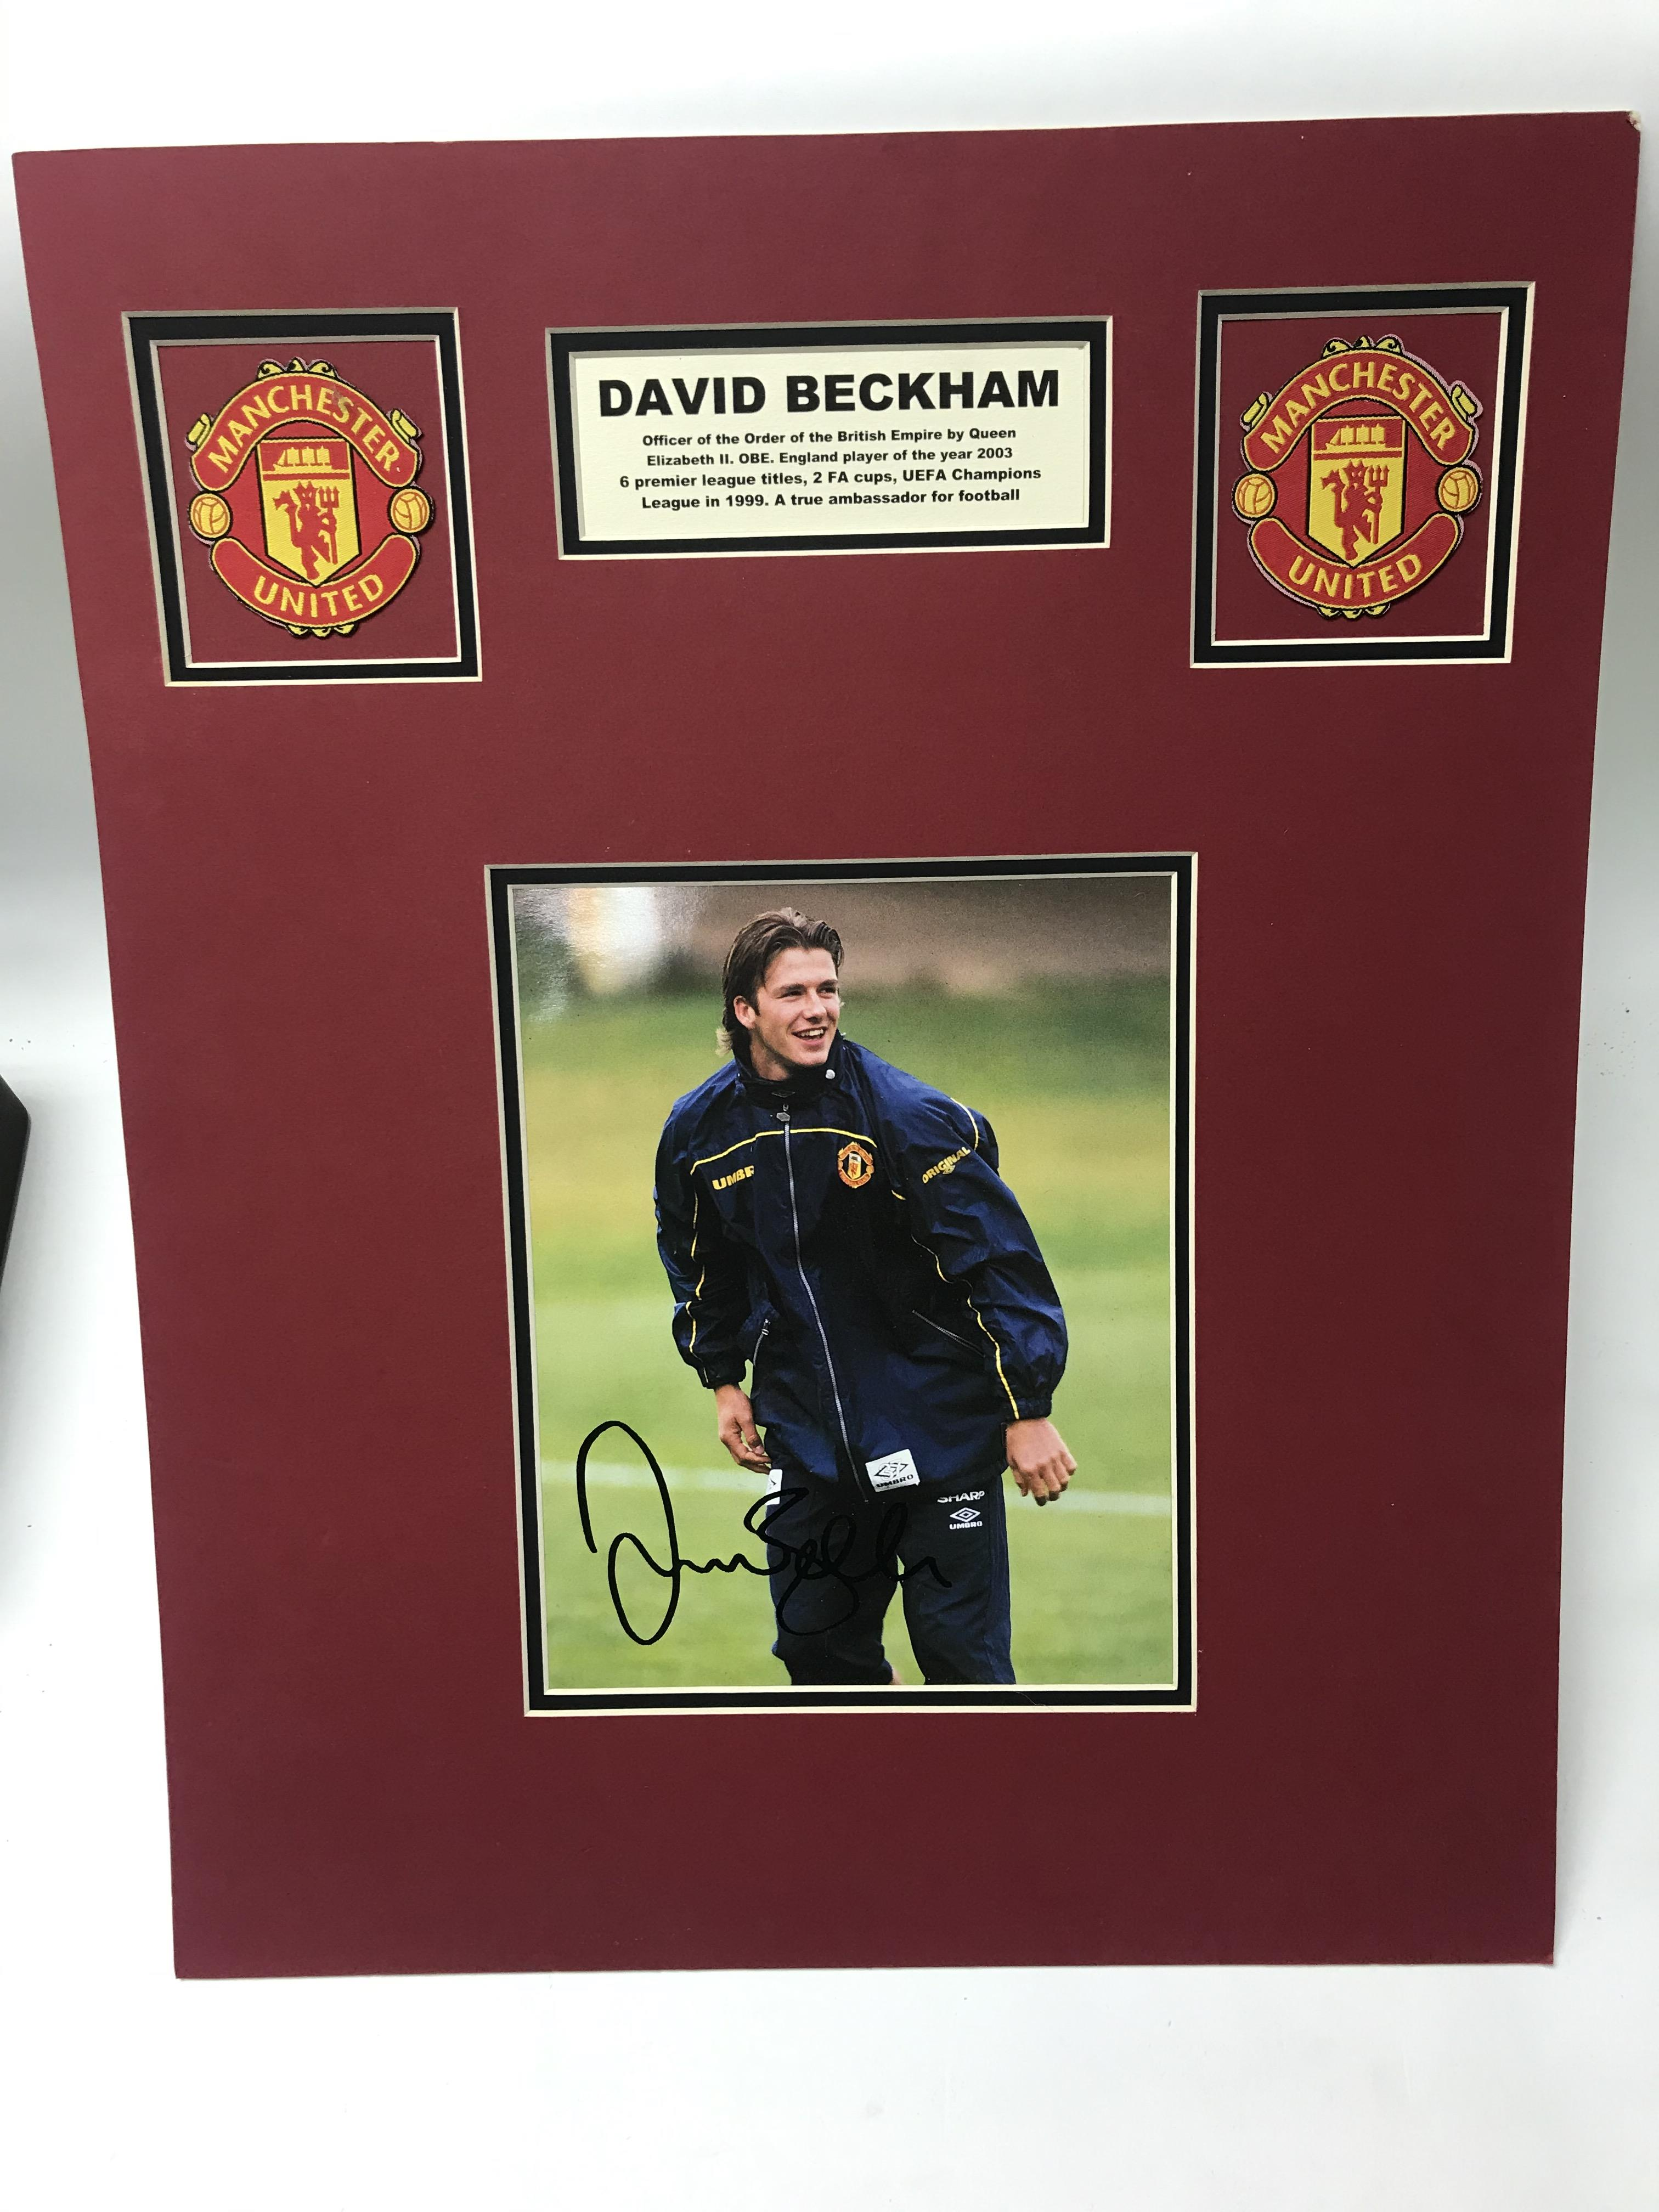 Lot 17 - An original mounted and signed David Beckham Manchester United photo